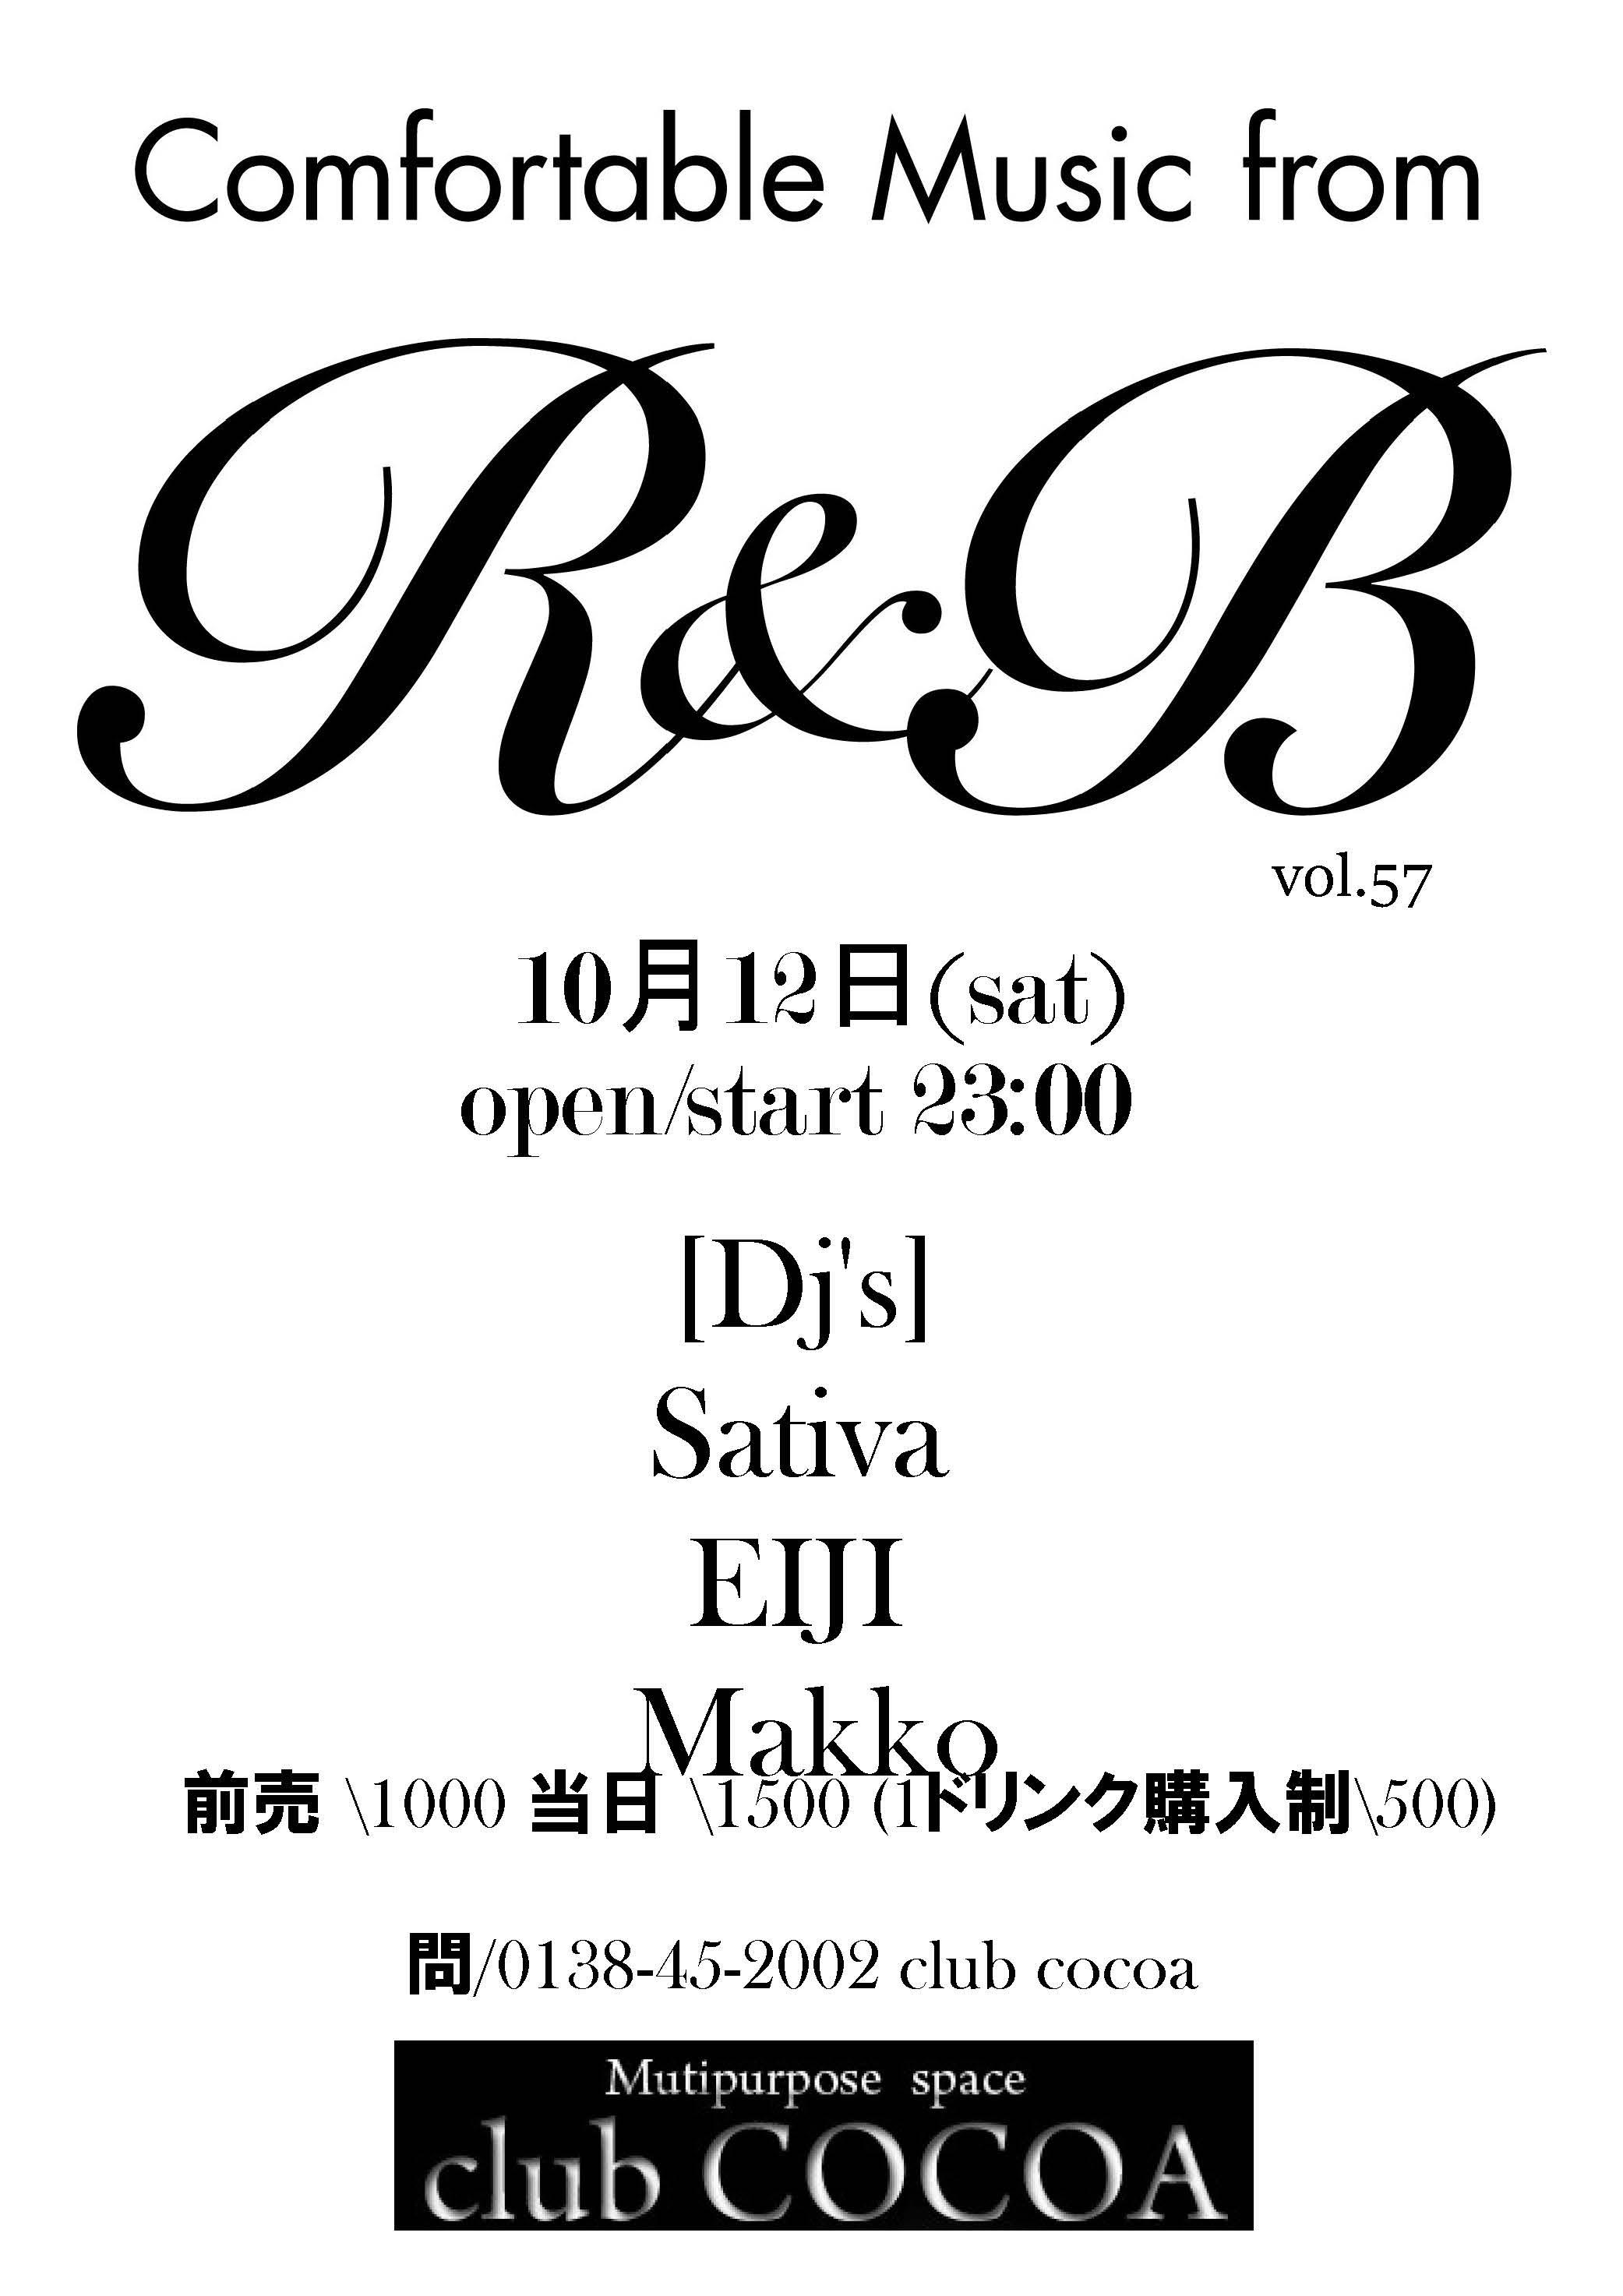 Comfortable Music from R&B vol.57 (R&B) @ 函館 Club COCOA